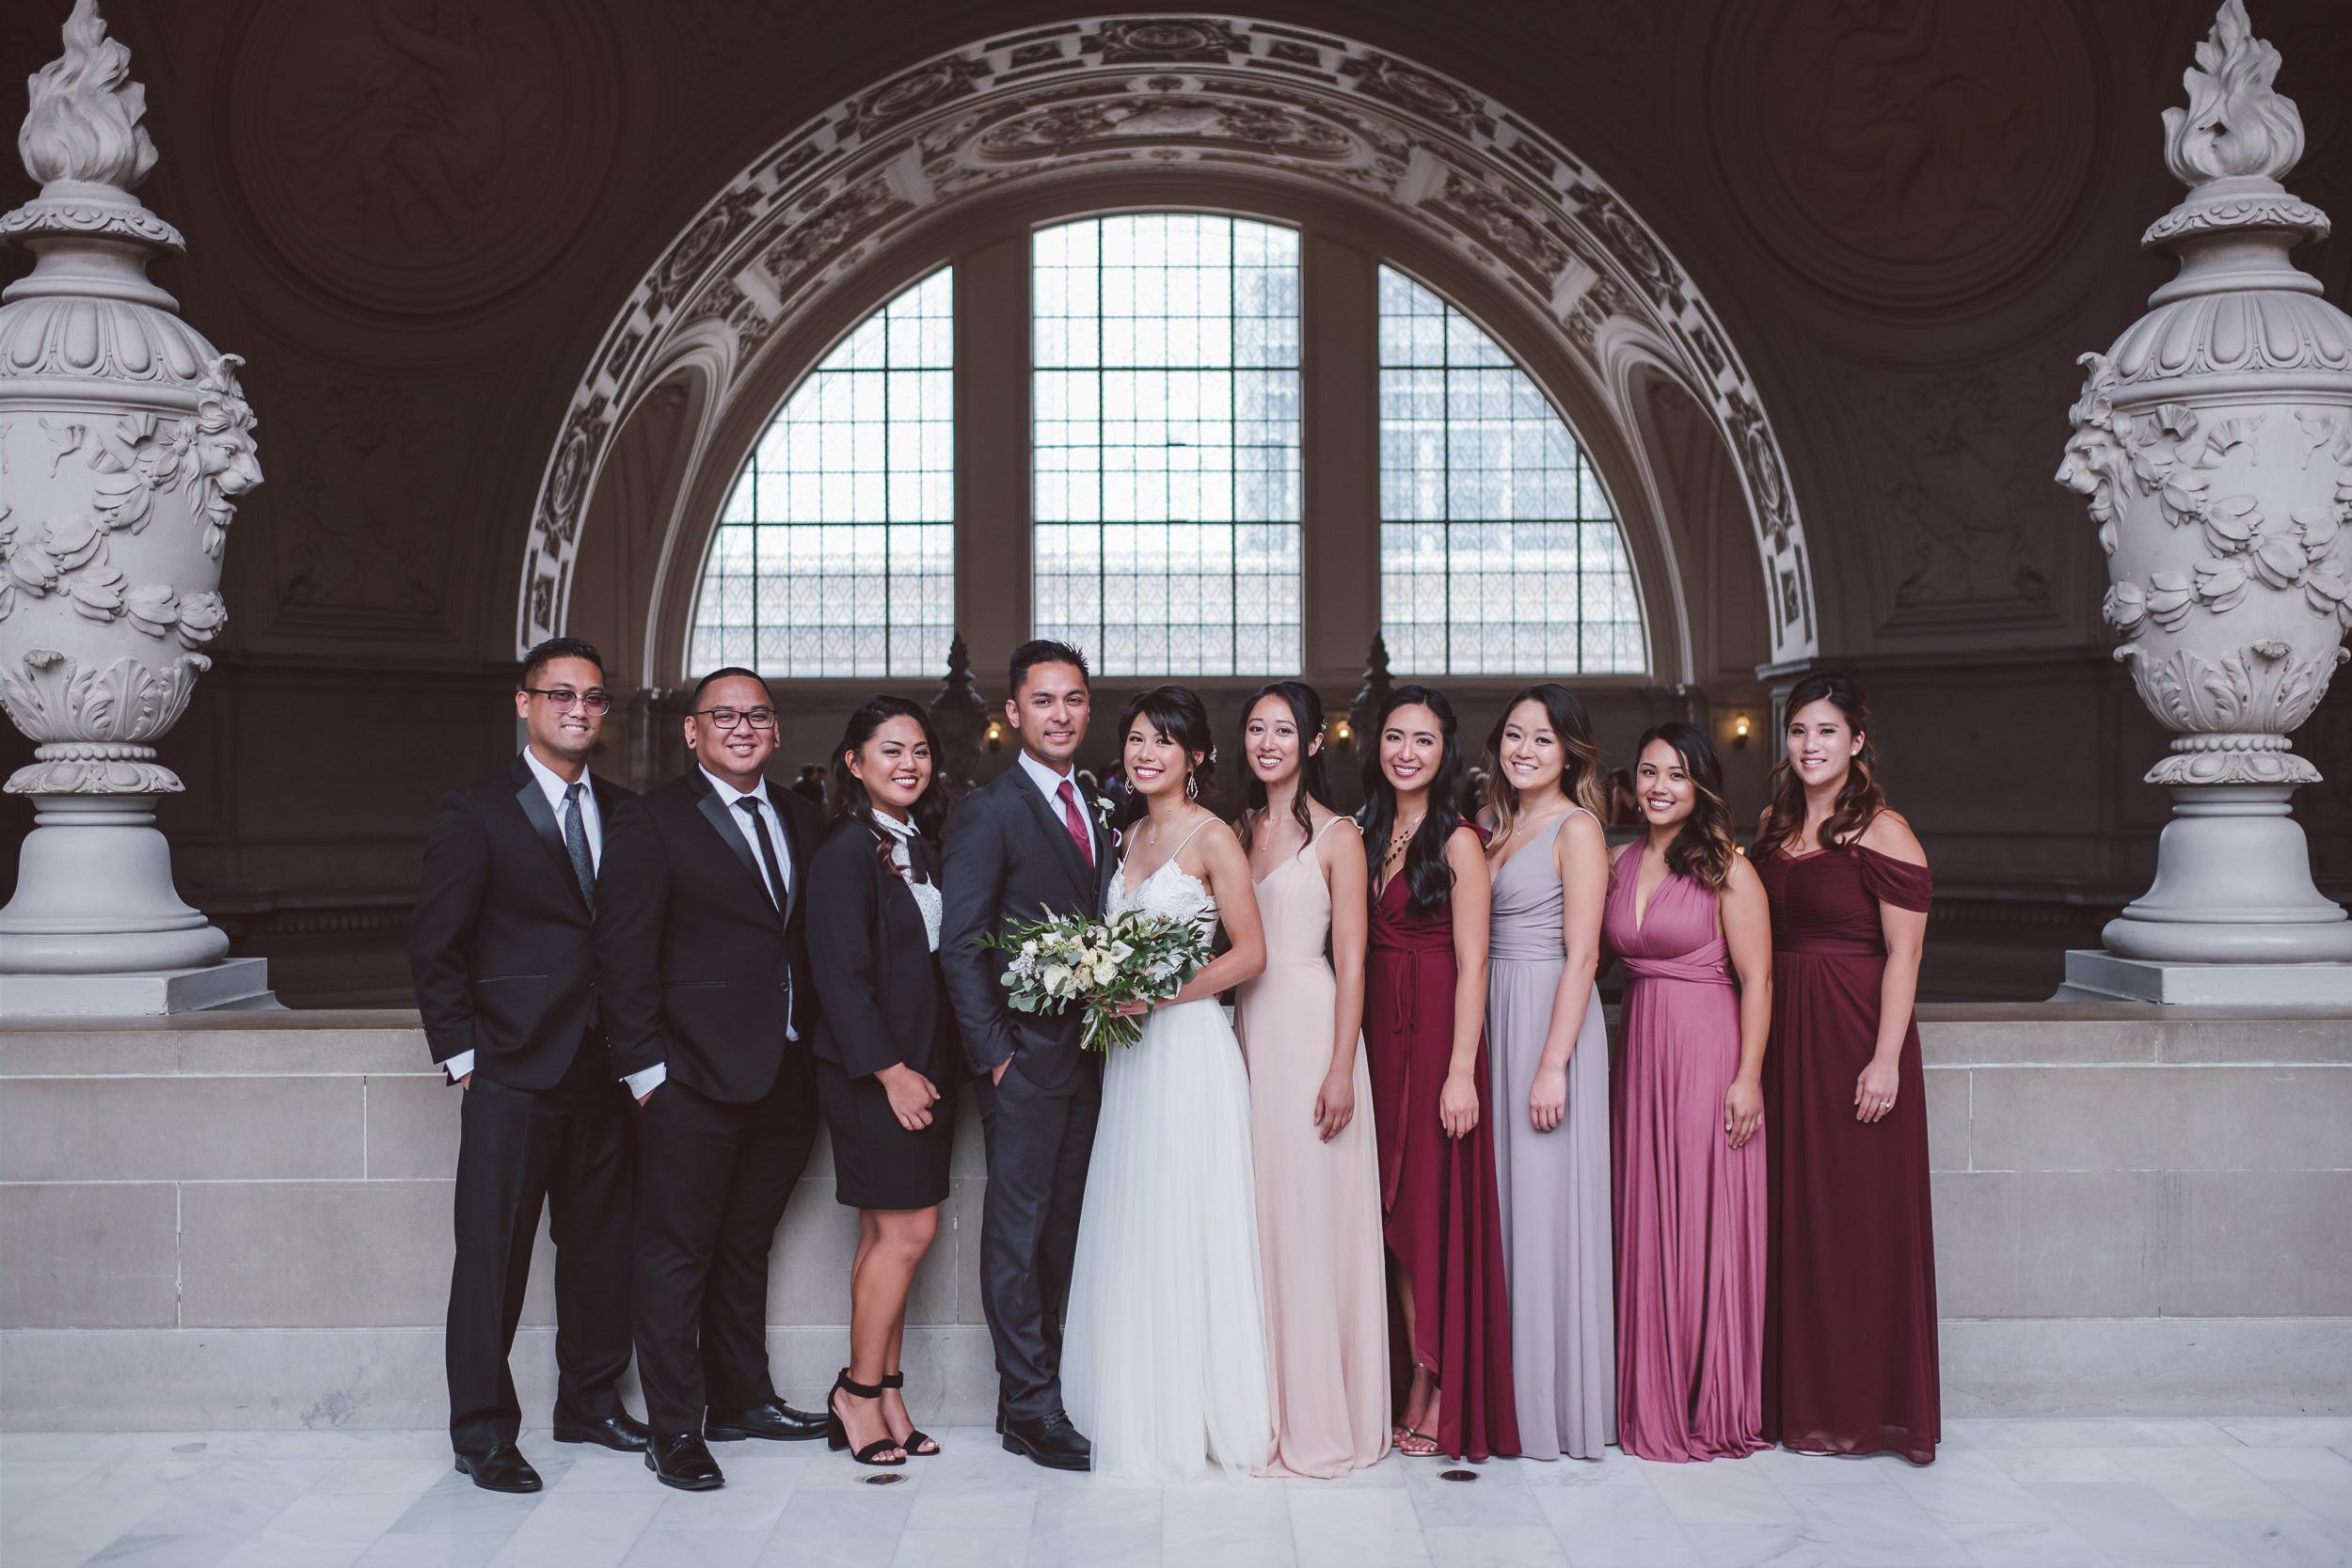 San-Francisco-City-Hall-Wedding-Photography-053.jpg